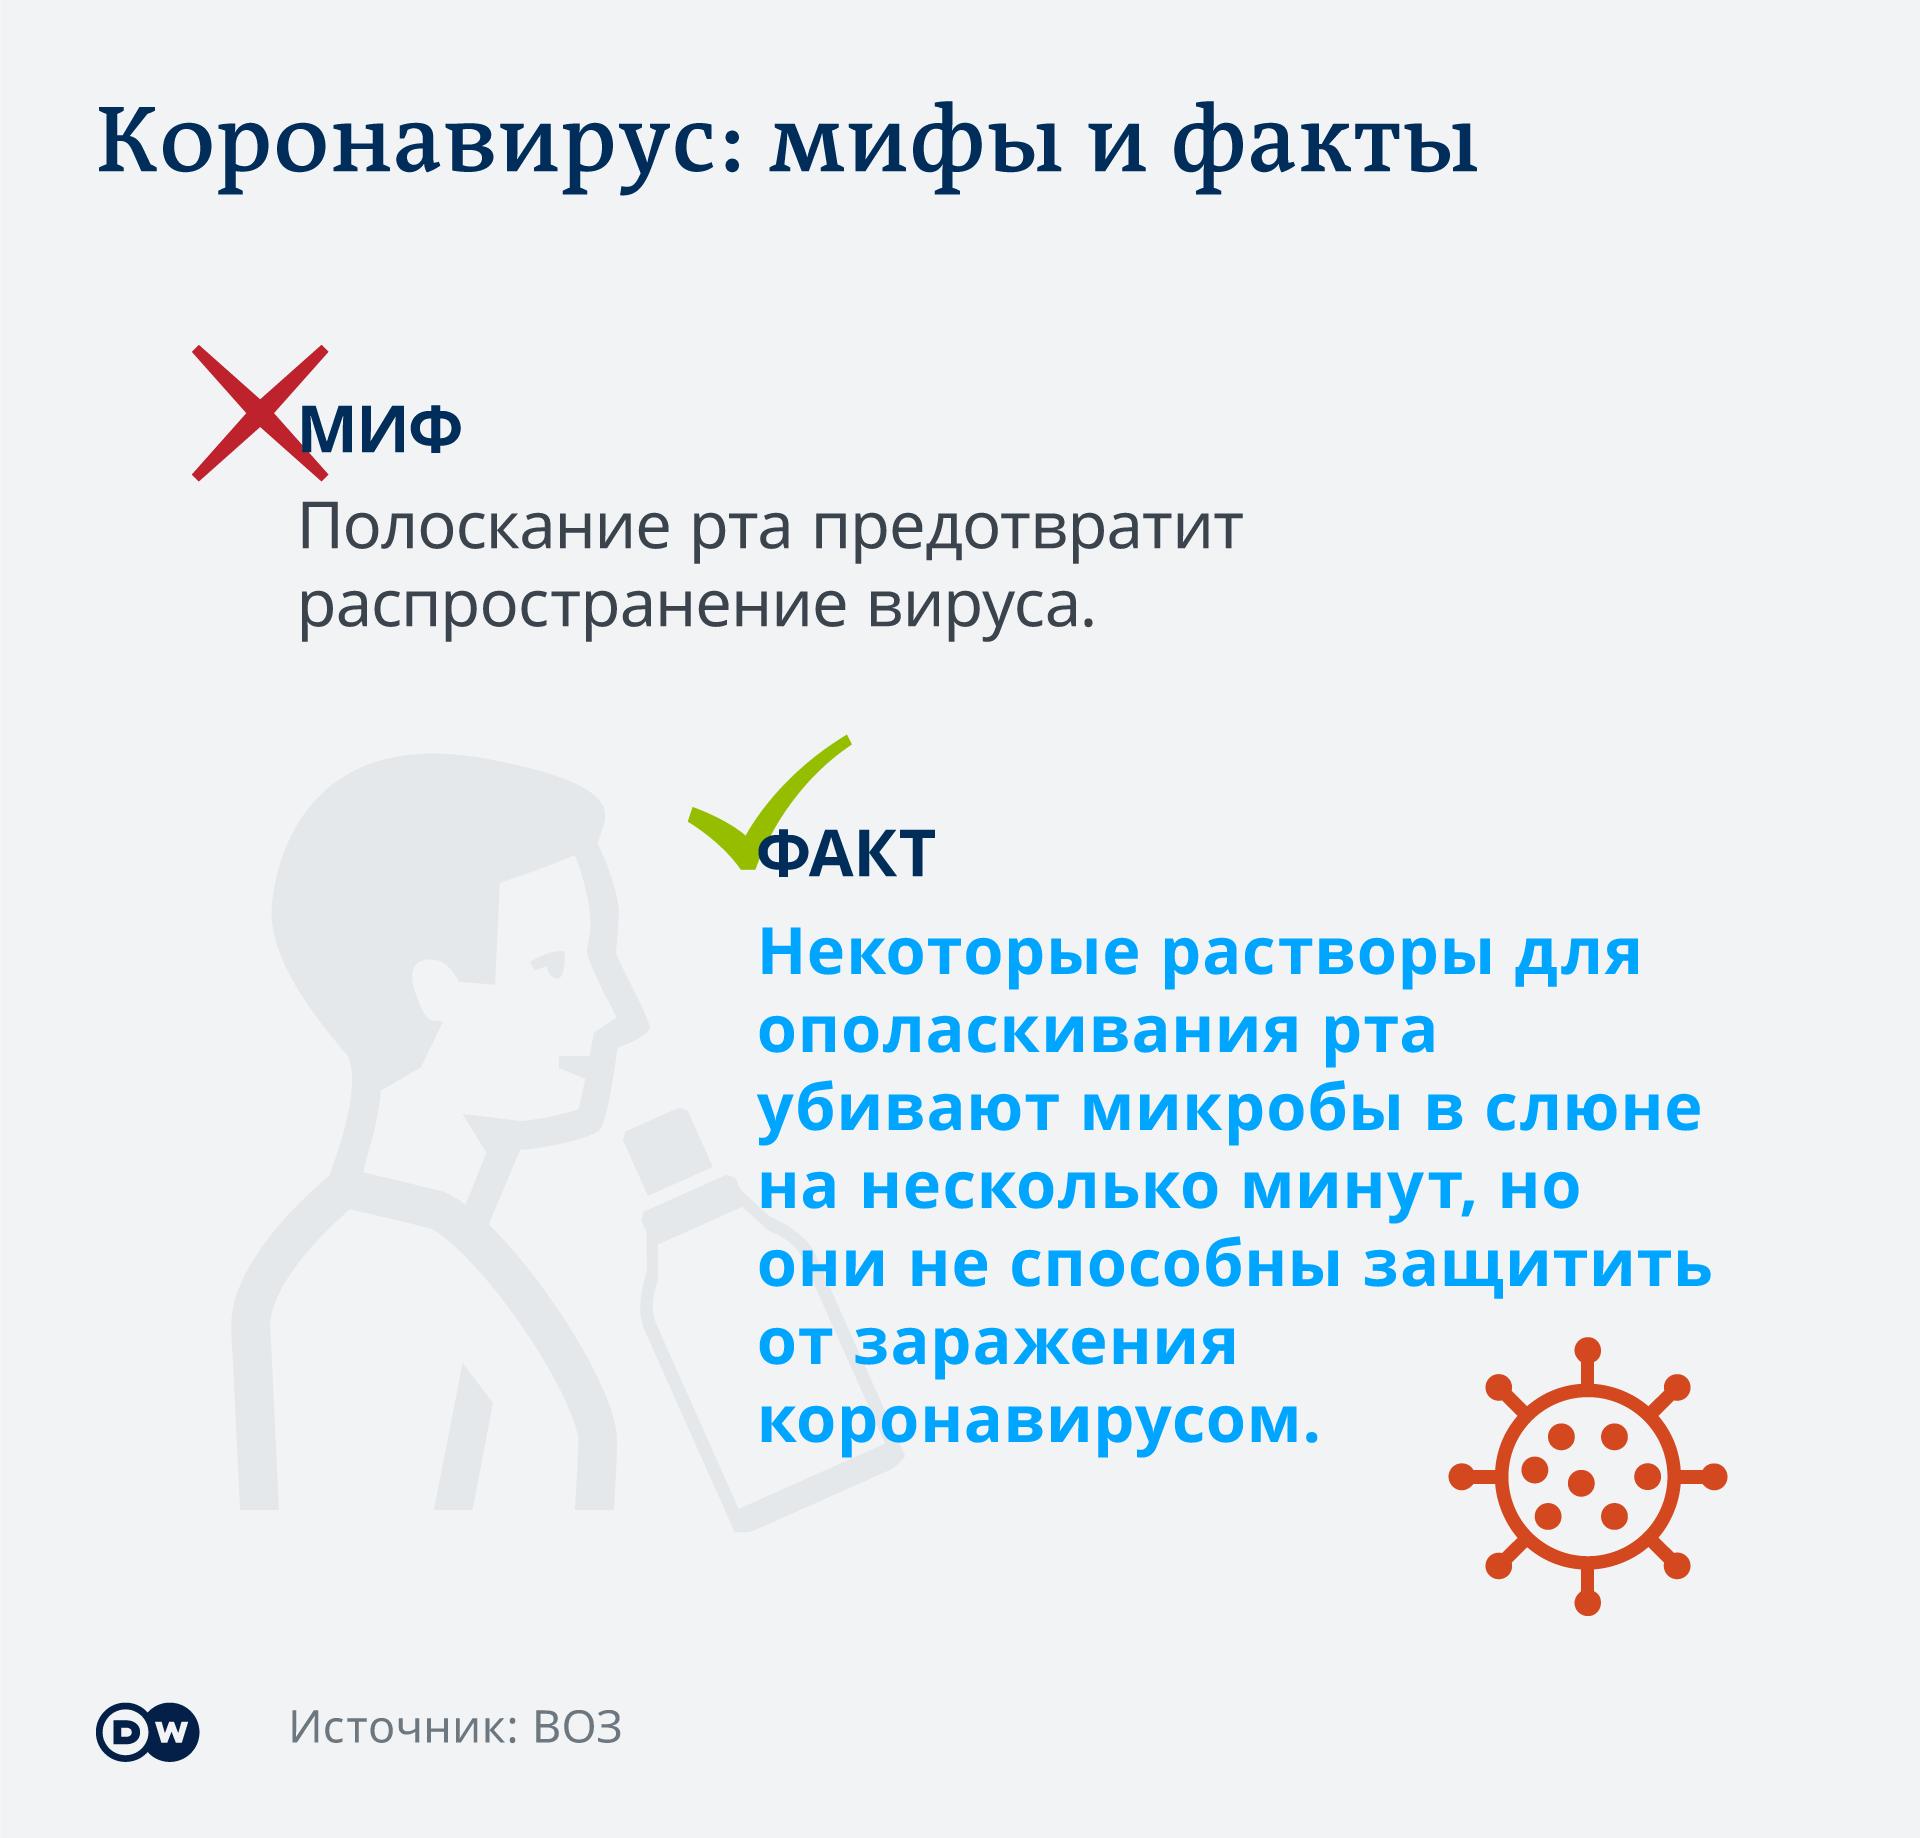 Infografik Coronavirus Mythen Tatsachen Mundwasser RU